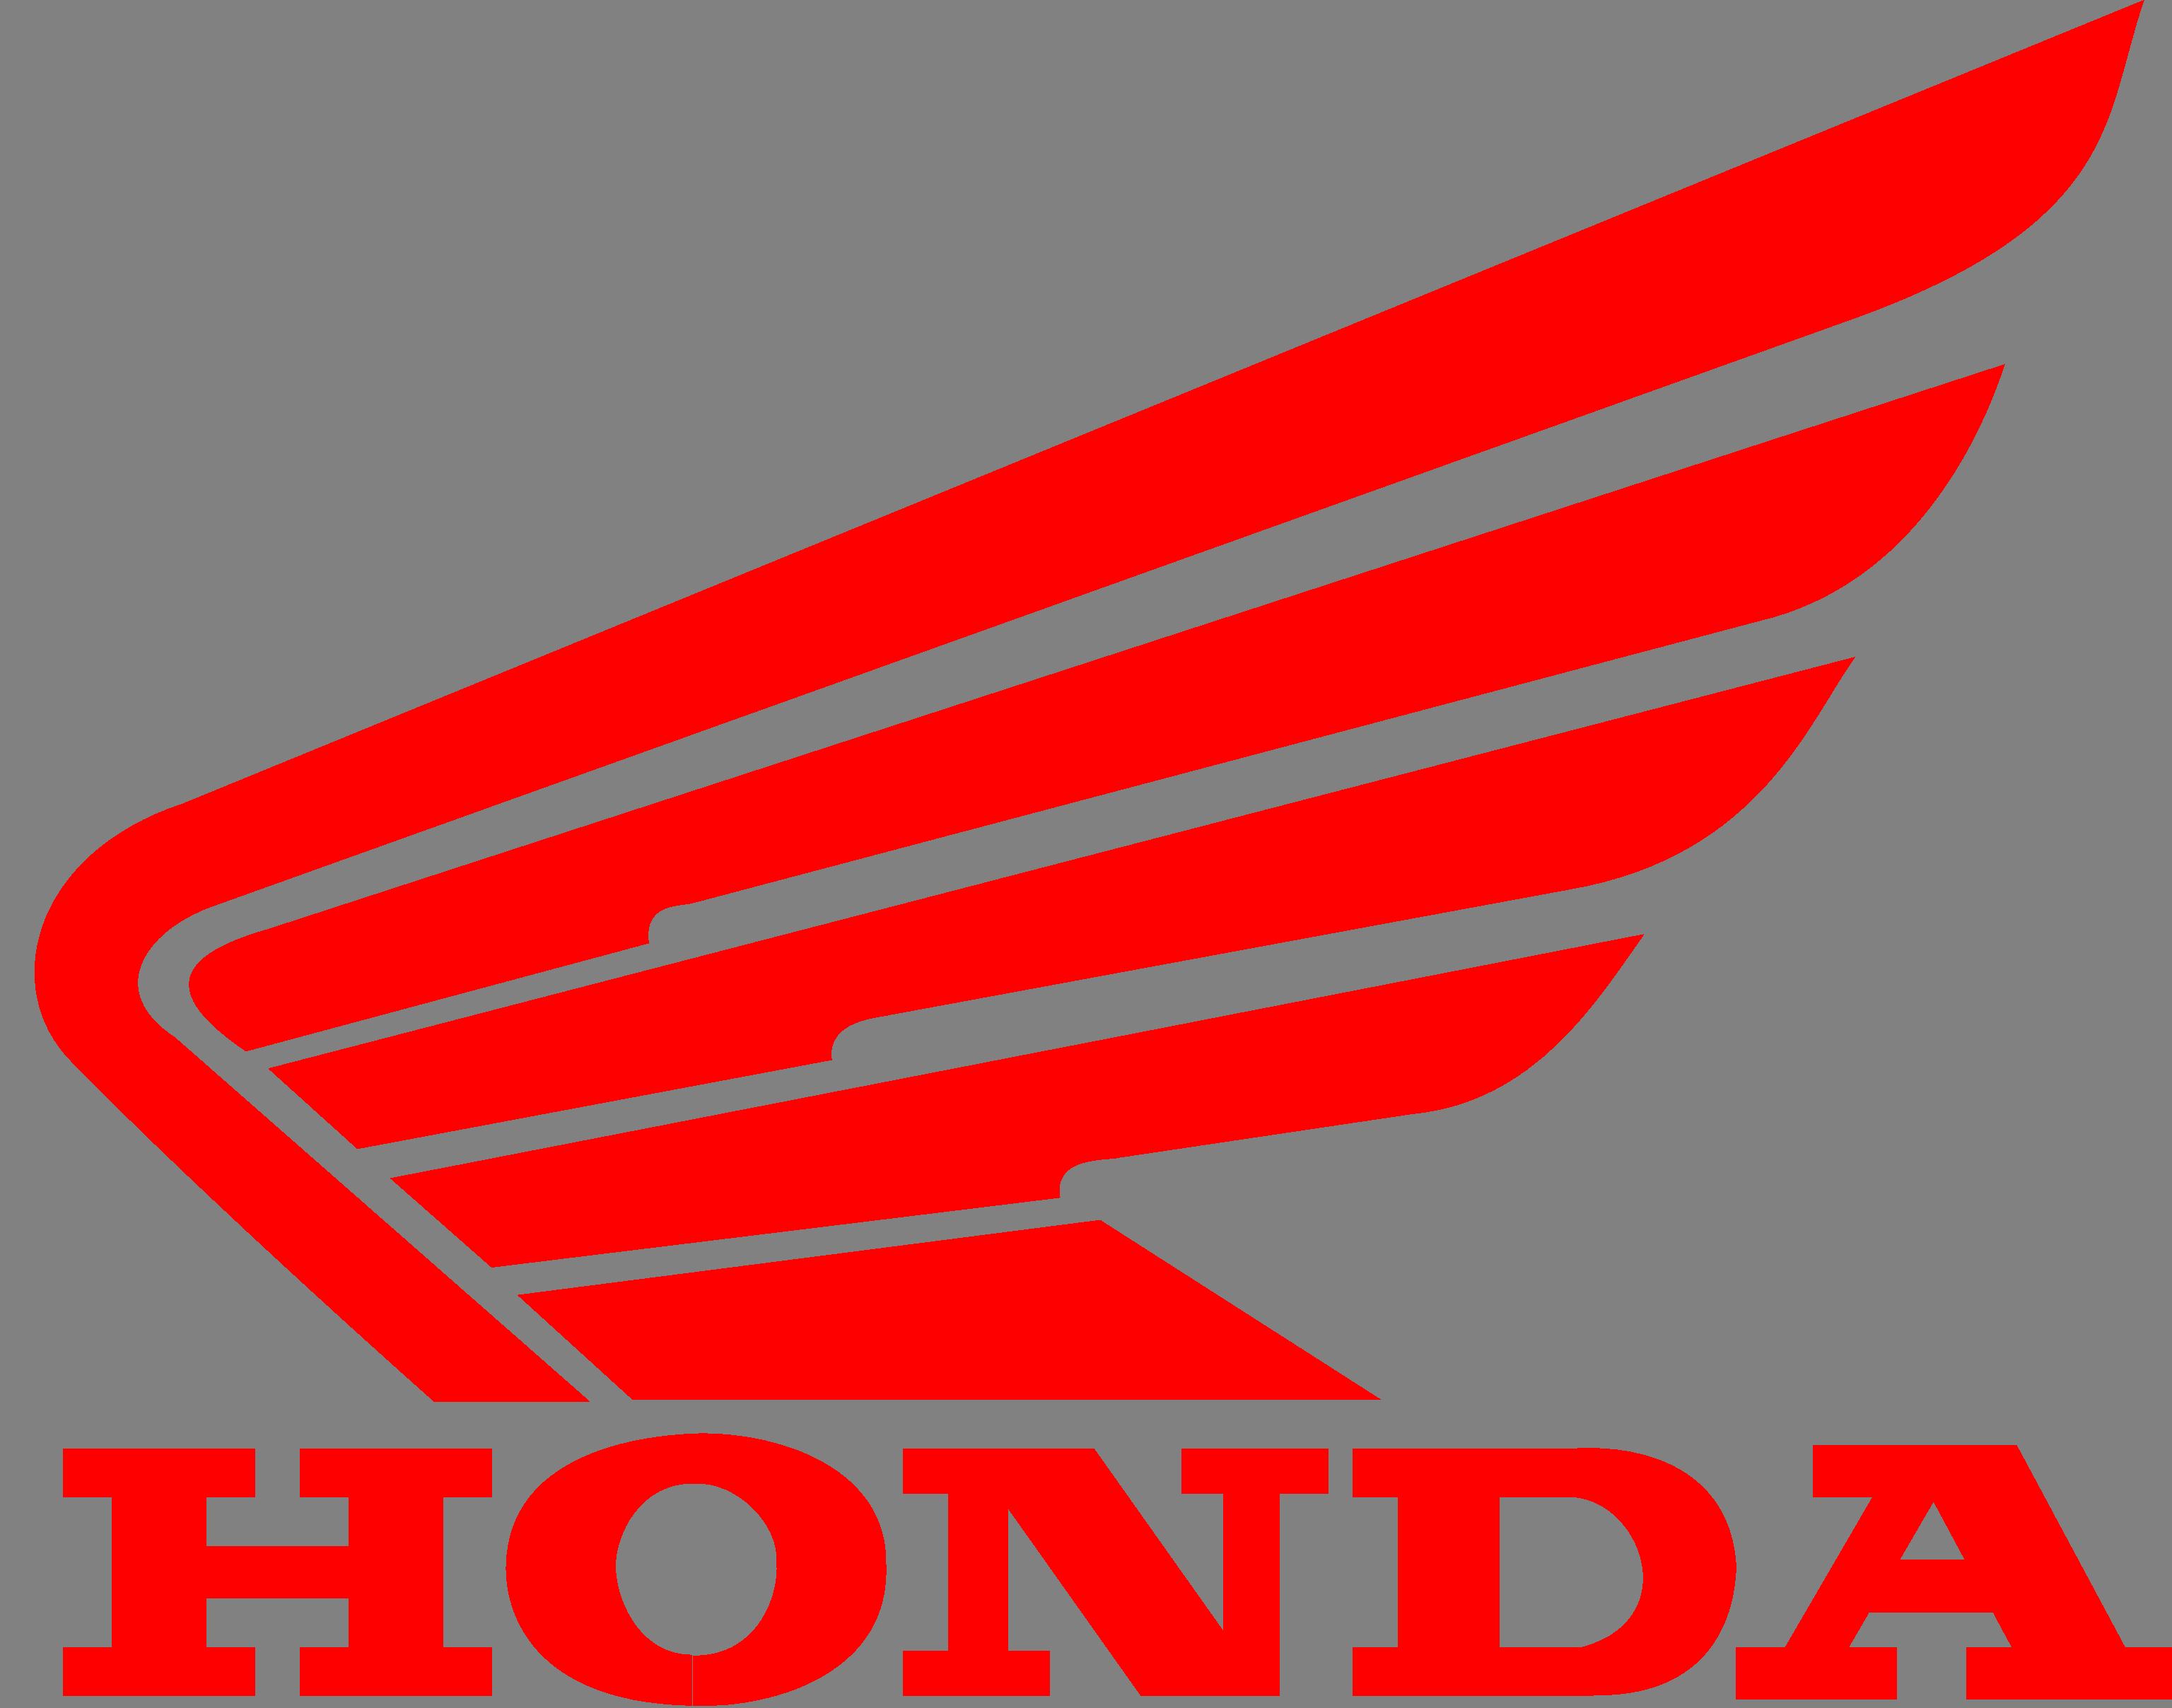 Car With Wings Logo Chrysler Logo Chrysler Car Symbol Meaning And